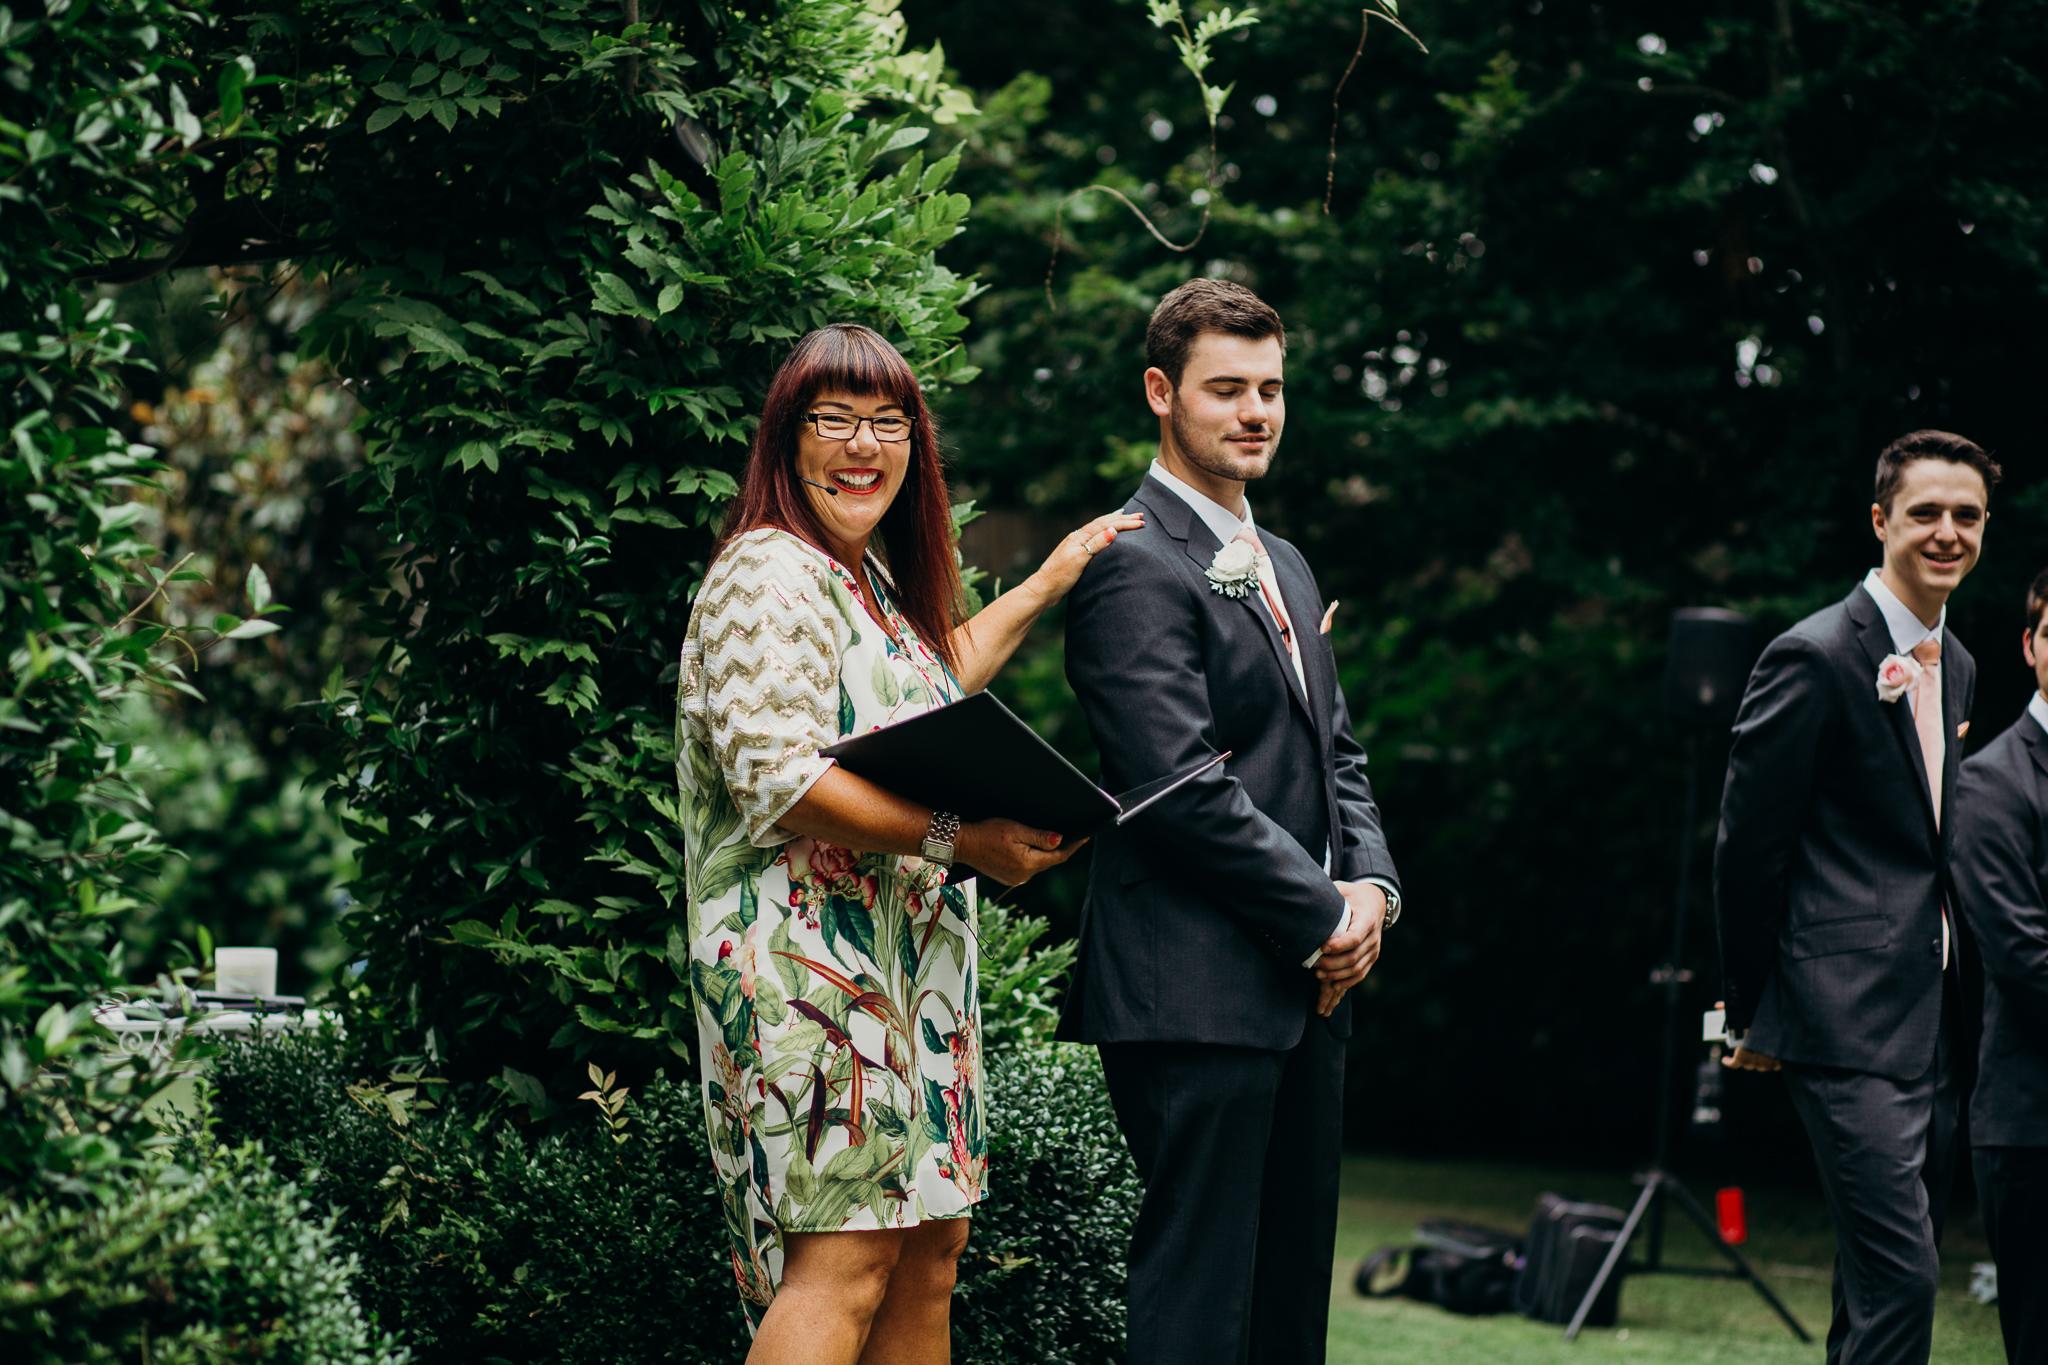 Tauranga-Coromandel-Elegant-Wedding-Photographer-Charlemagne-Lodge-59.jpg